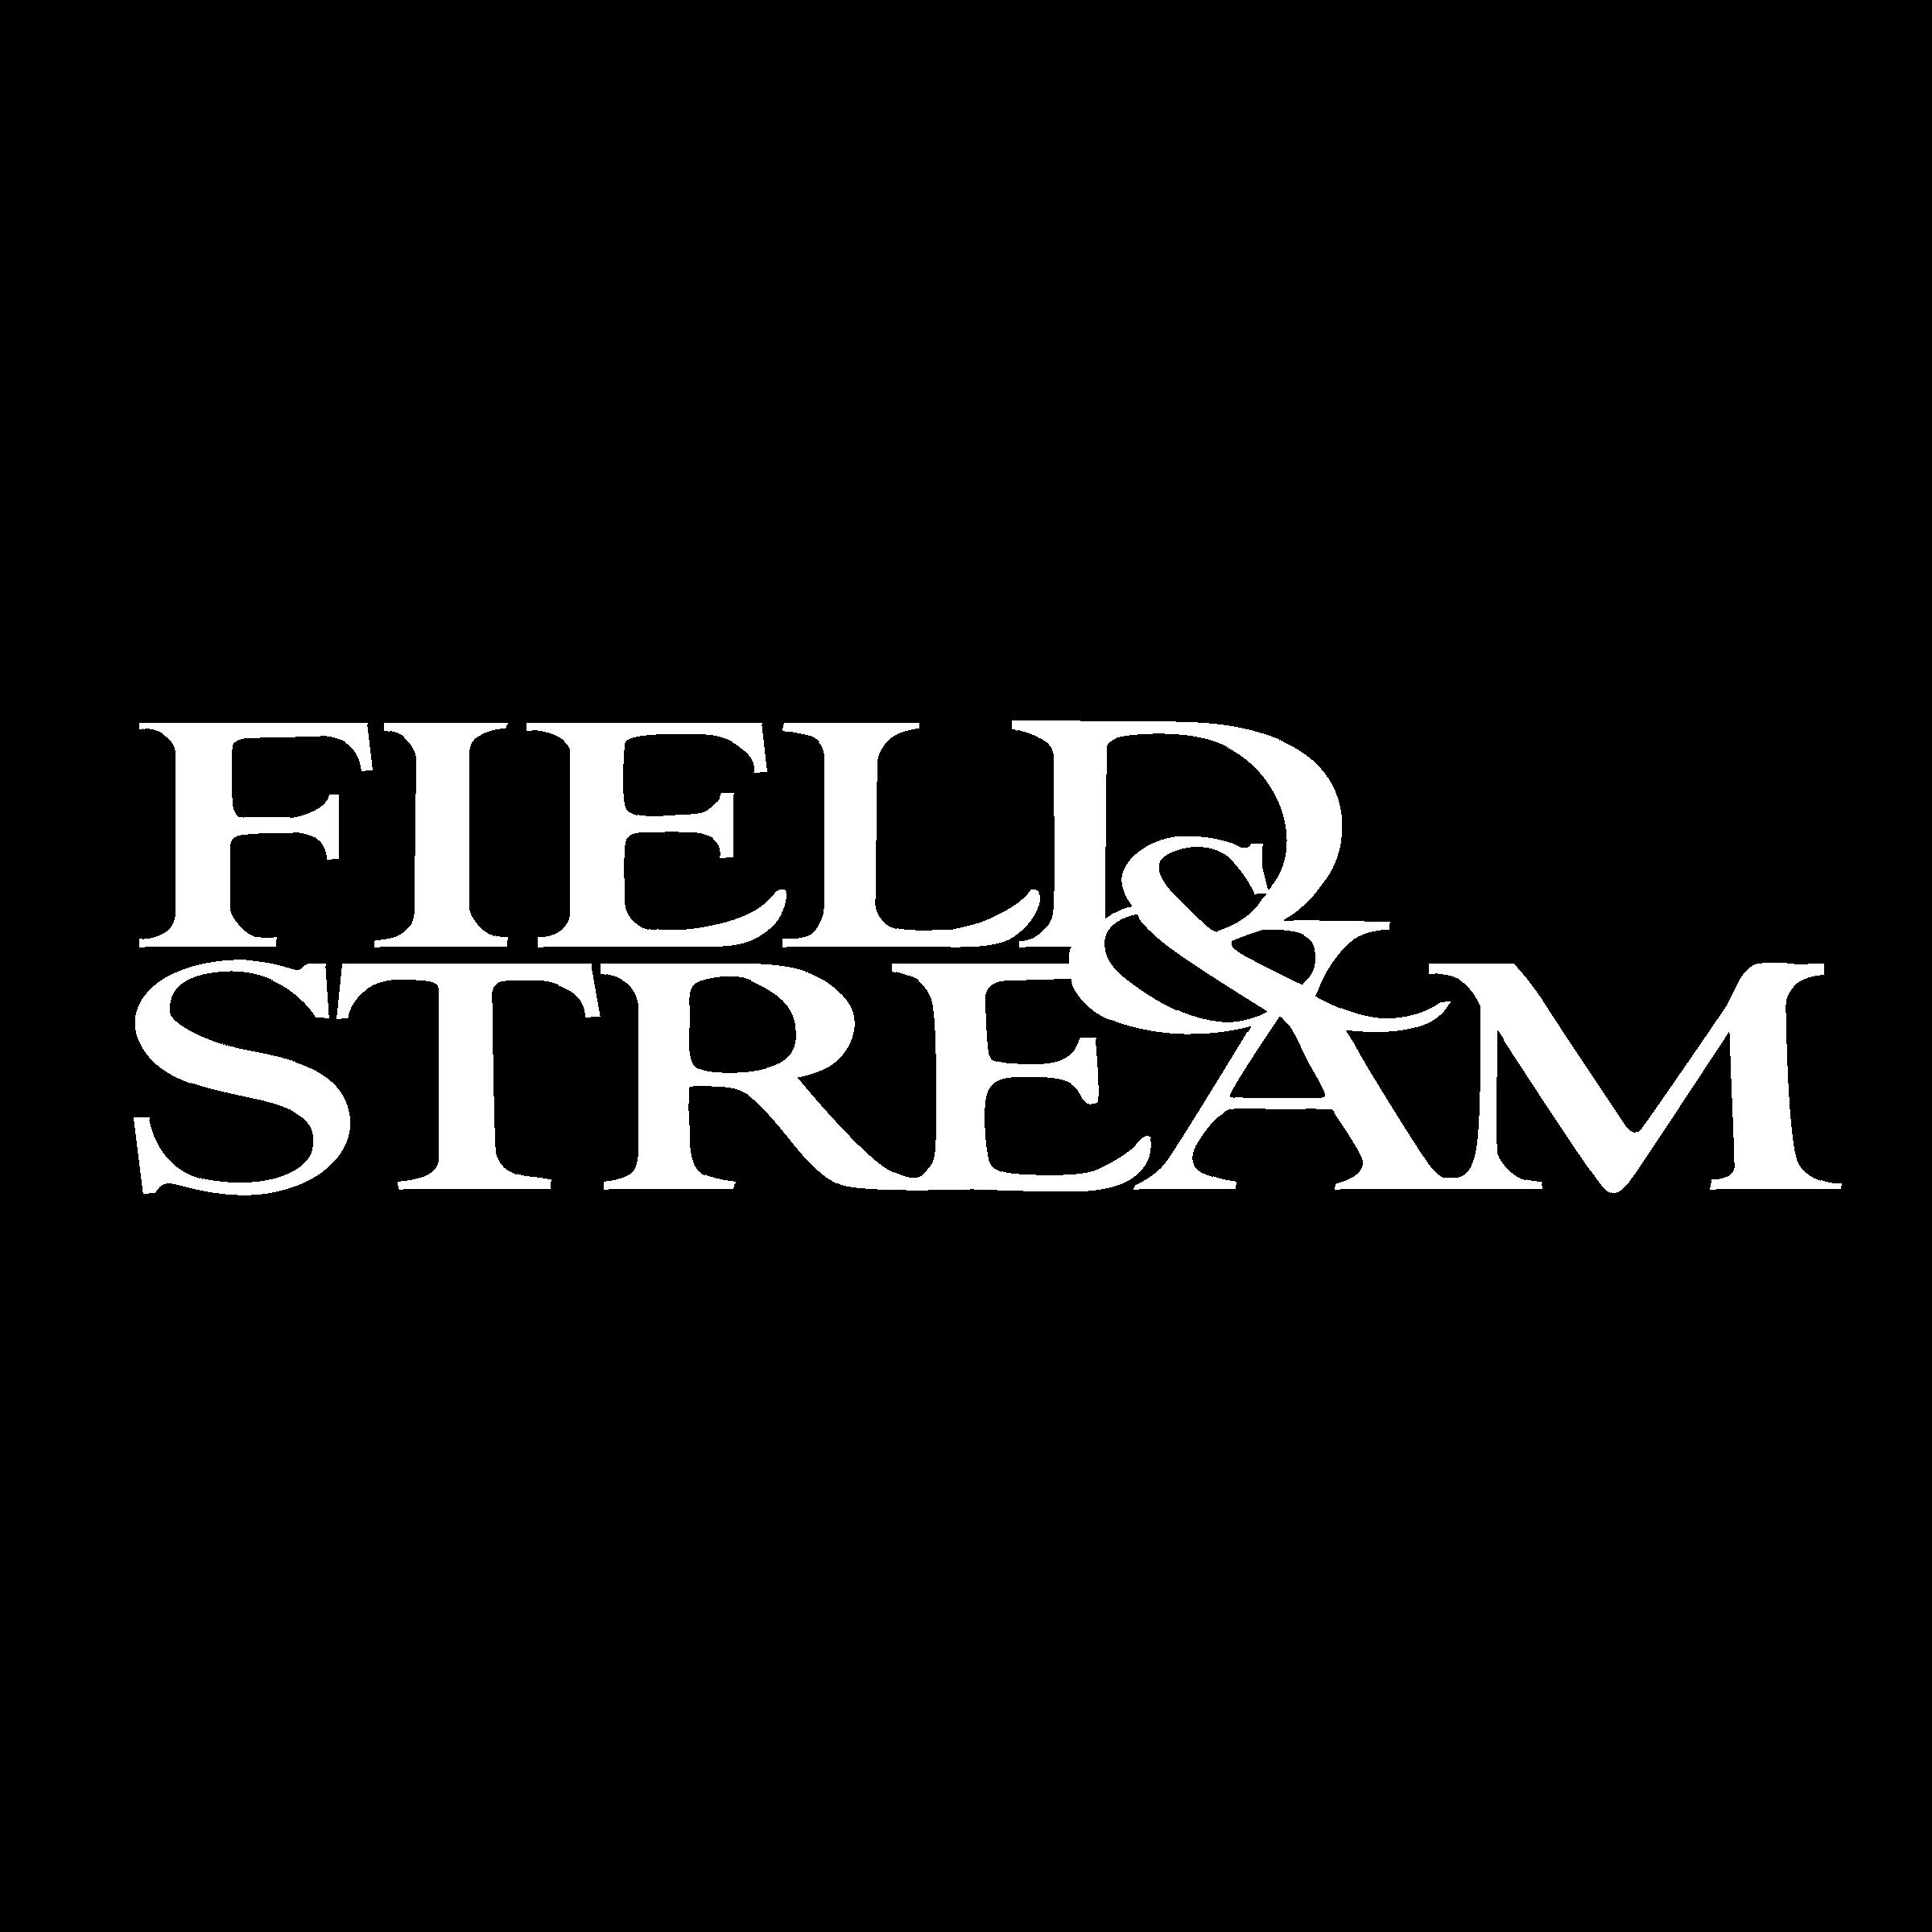 Field & Stream Logo PNG Transparent & SVG Vector.